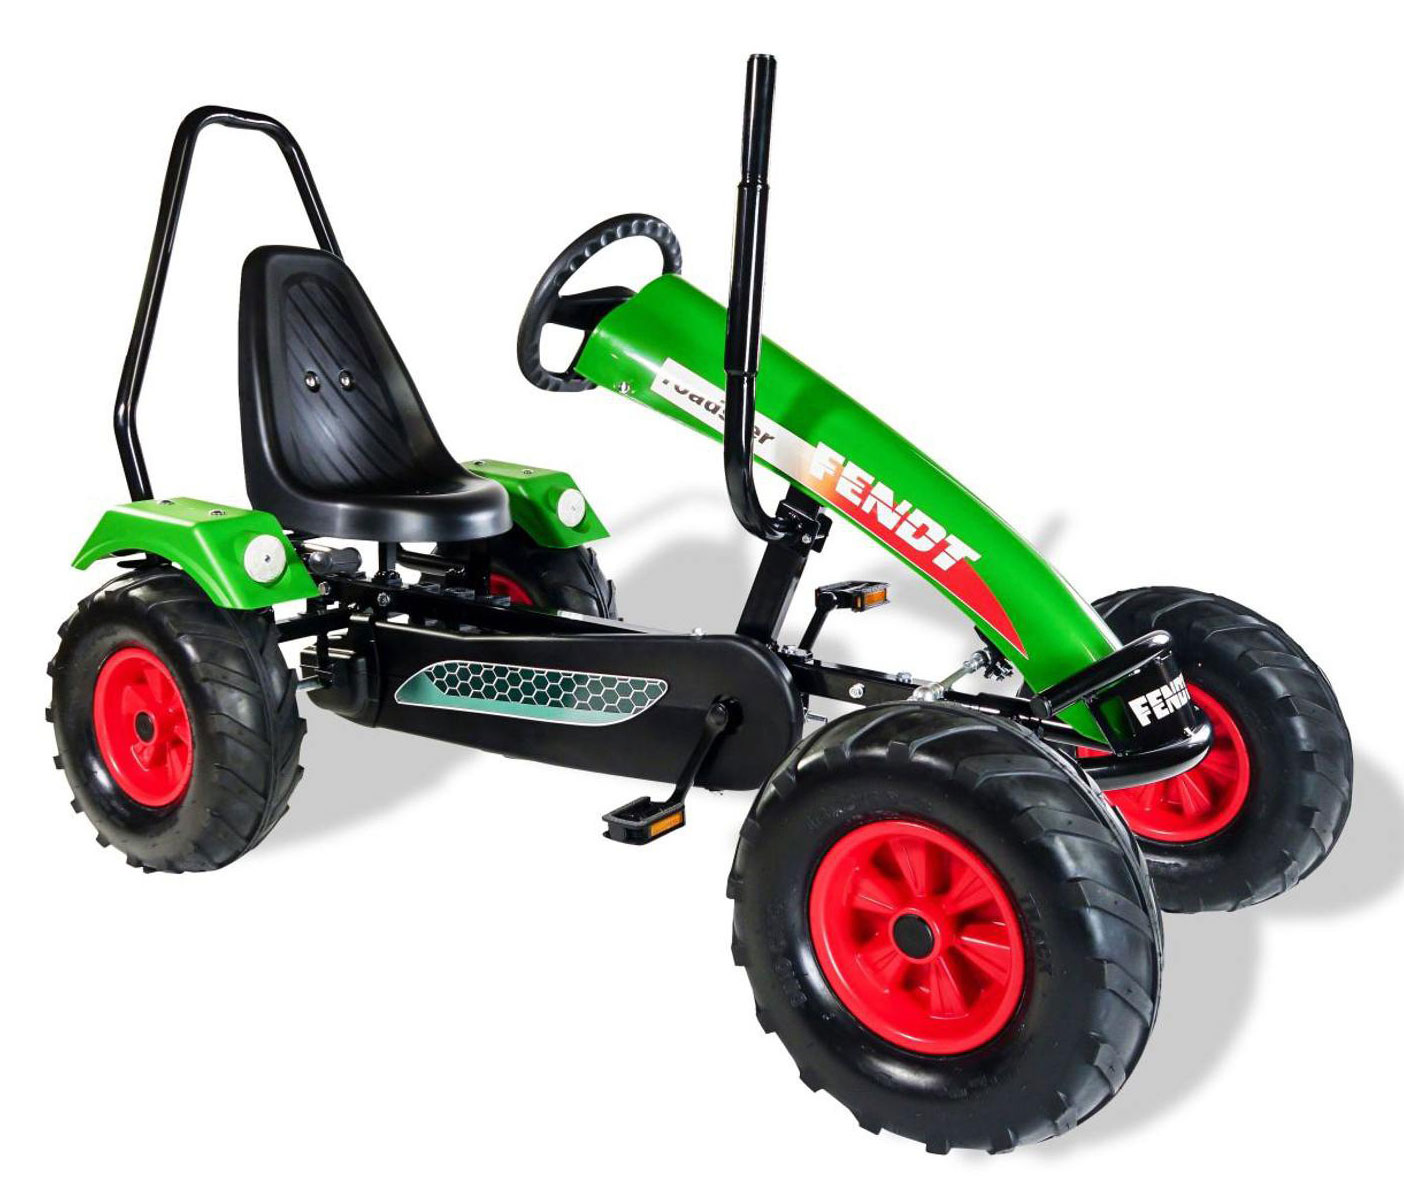 Gokart / Pedal-Gokart Track BF1 Fendt grün mit Überrollbügel DINO CARS Bild 1